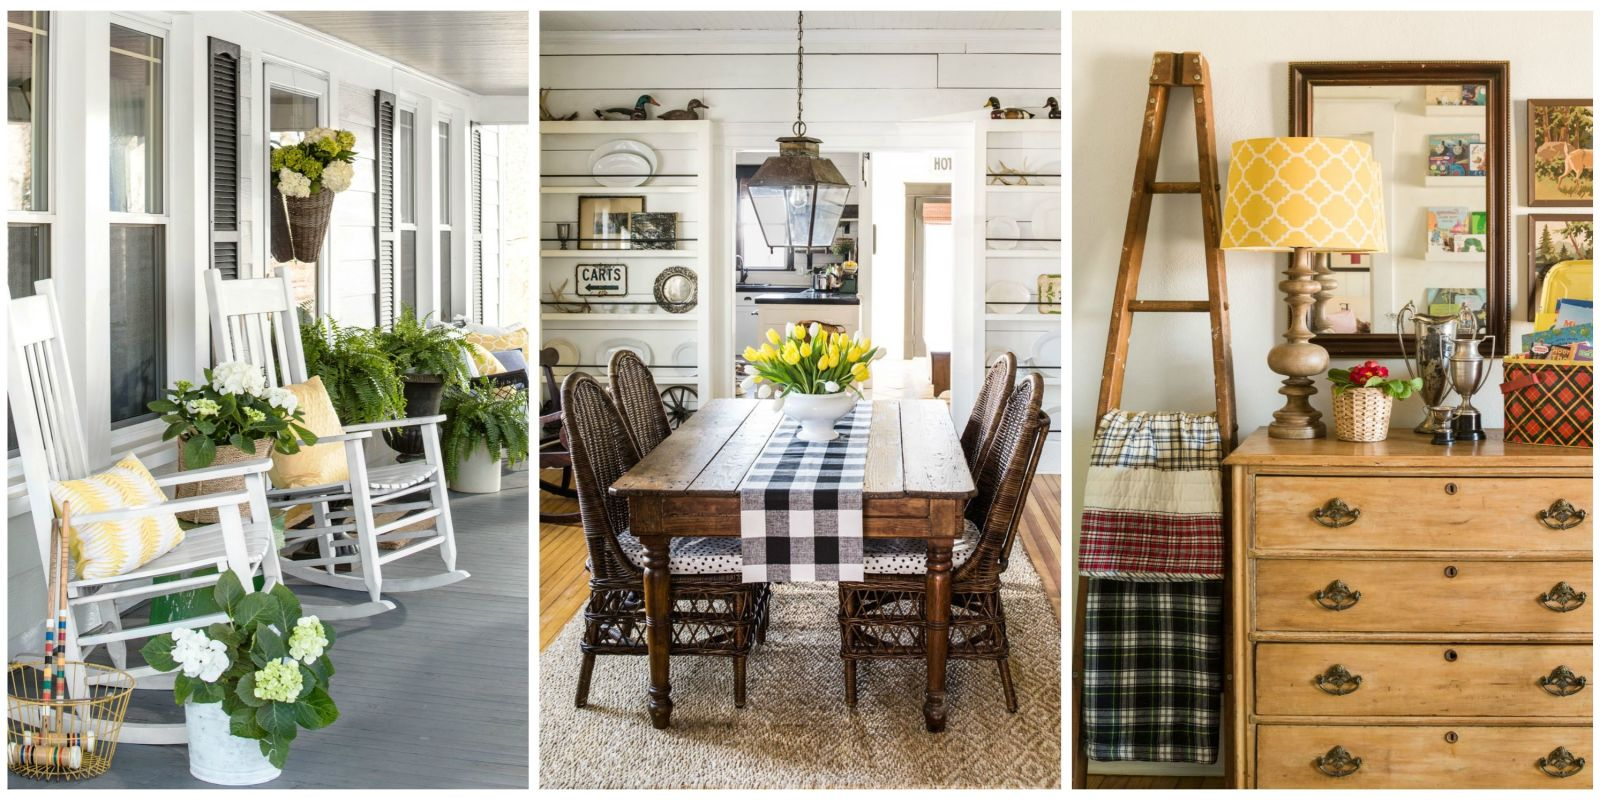 Fullsize Of Country Homes Design Ideas